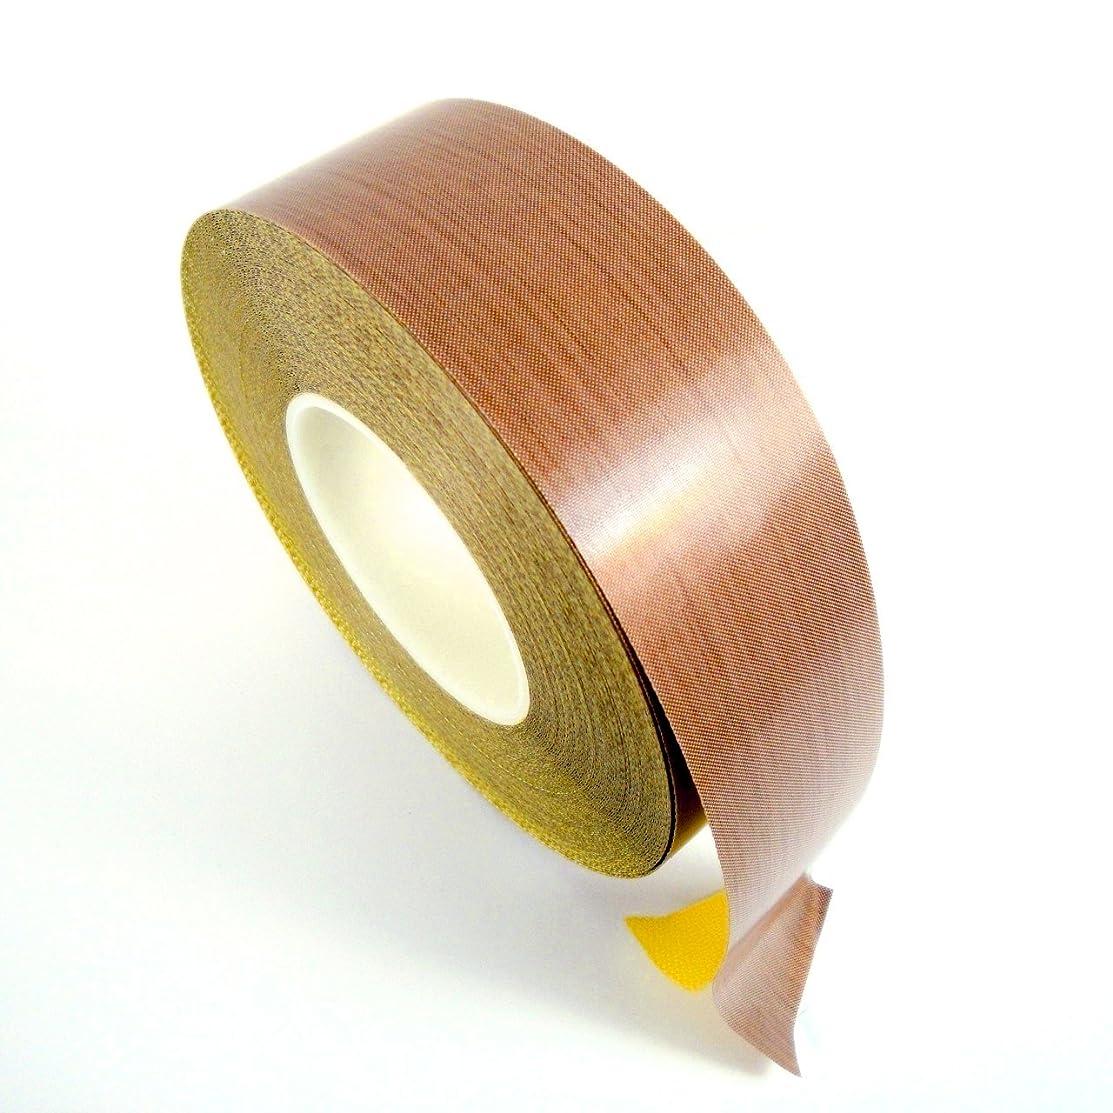 "VViViD High Temperature Resistant Adhesive PTFE Teflon 1/2"" x 33ft Tape Roll for Vacuum or Impulse Sealing Machines"